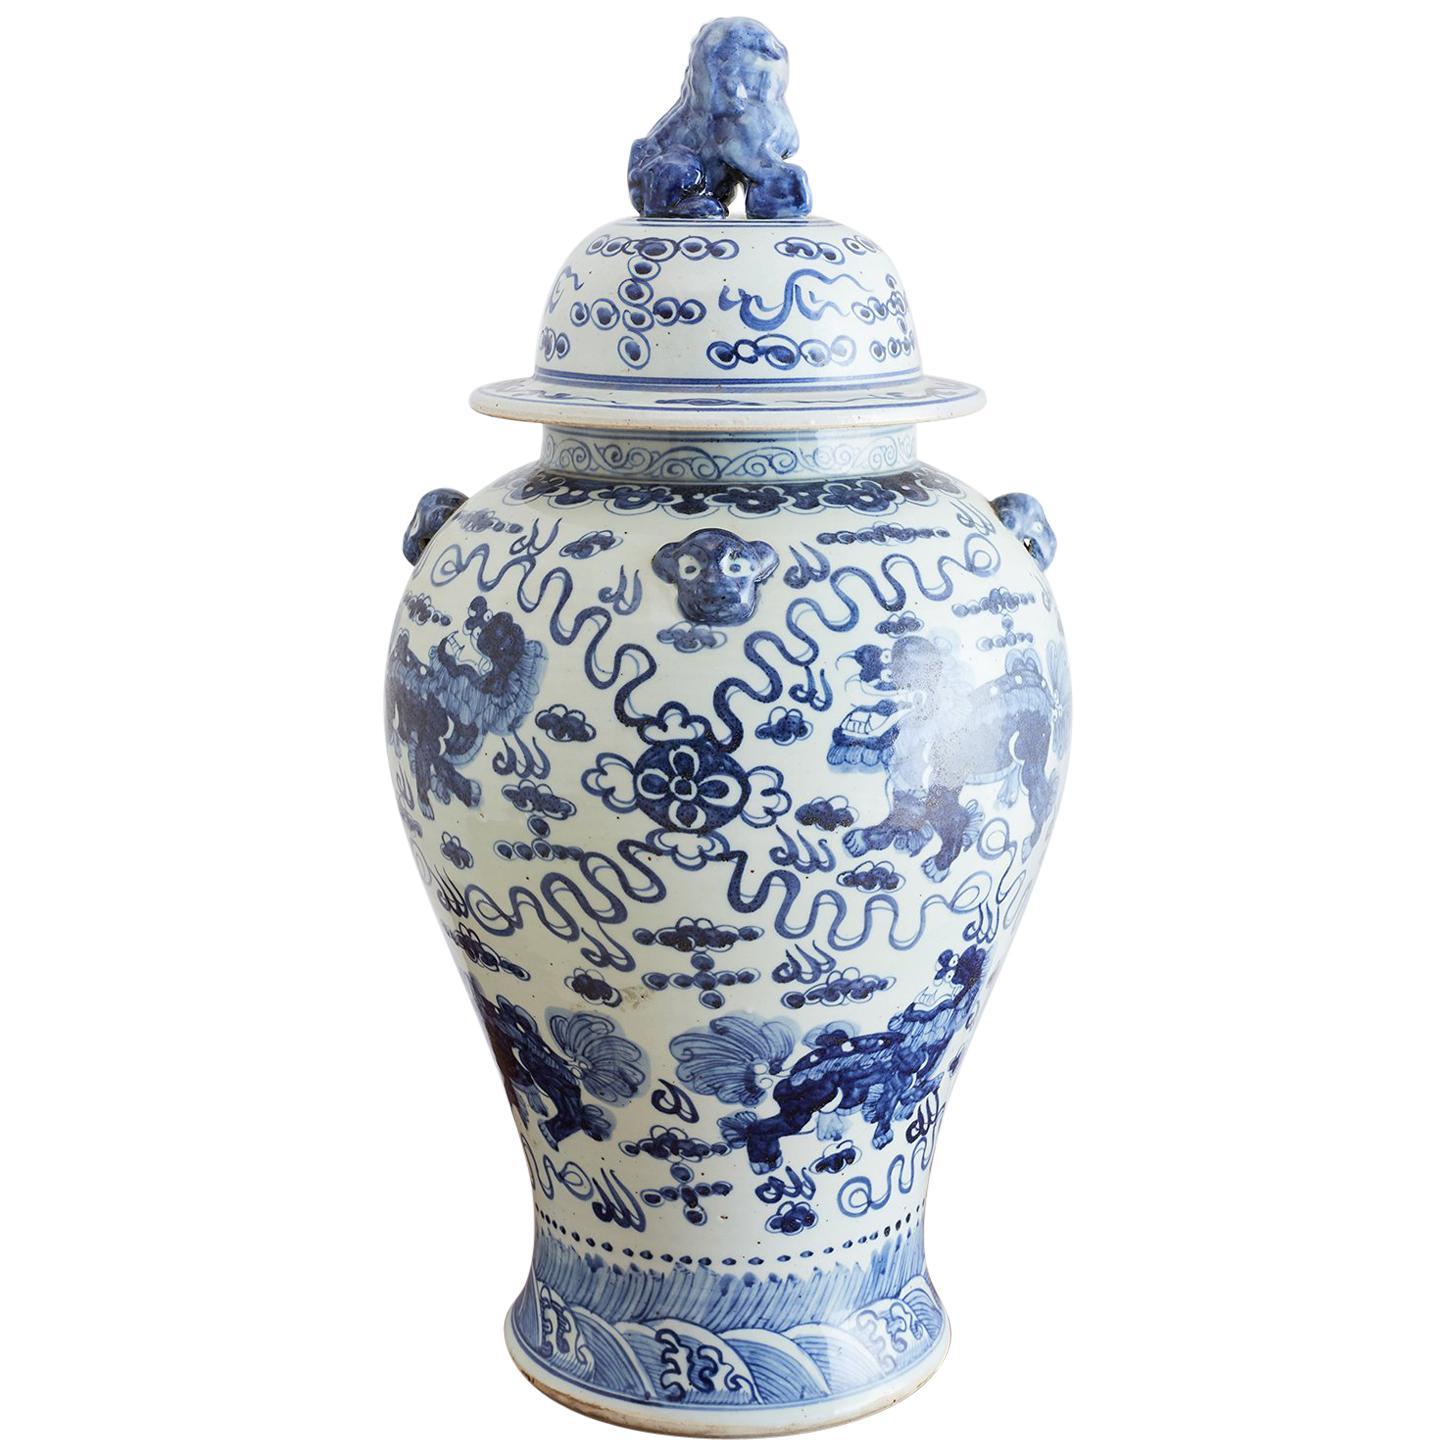 Monumental Chinese Blue and White Porcelain Ginger Jar